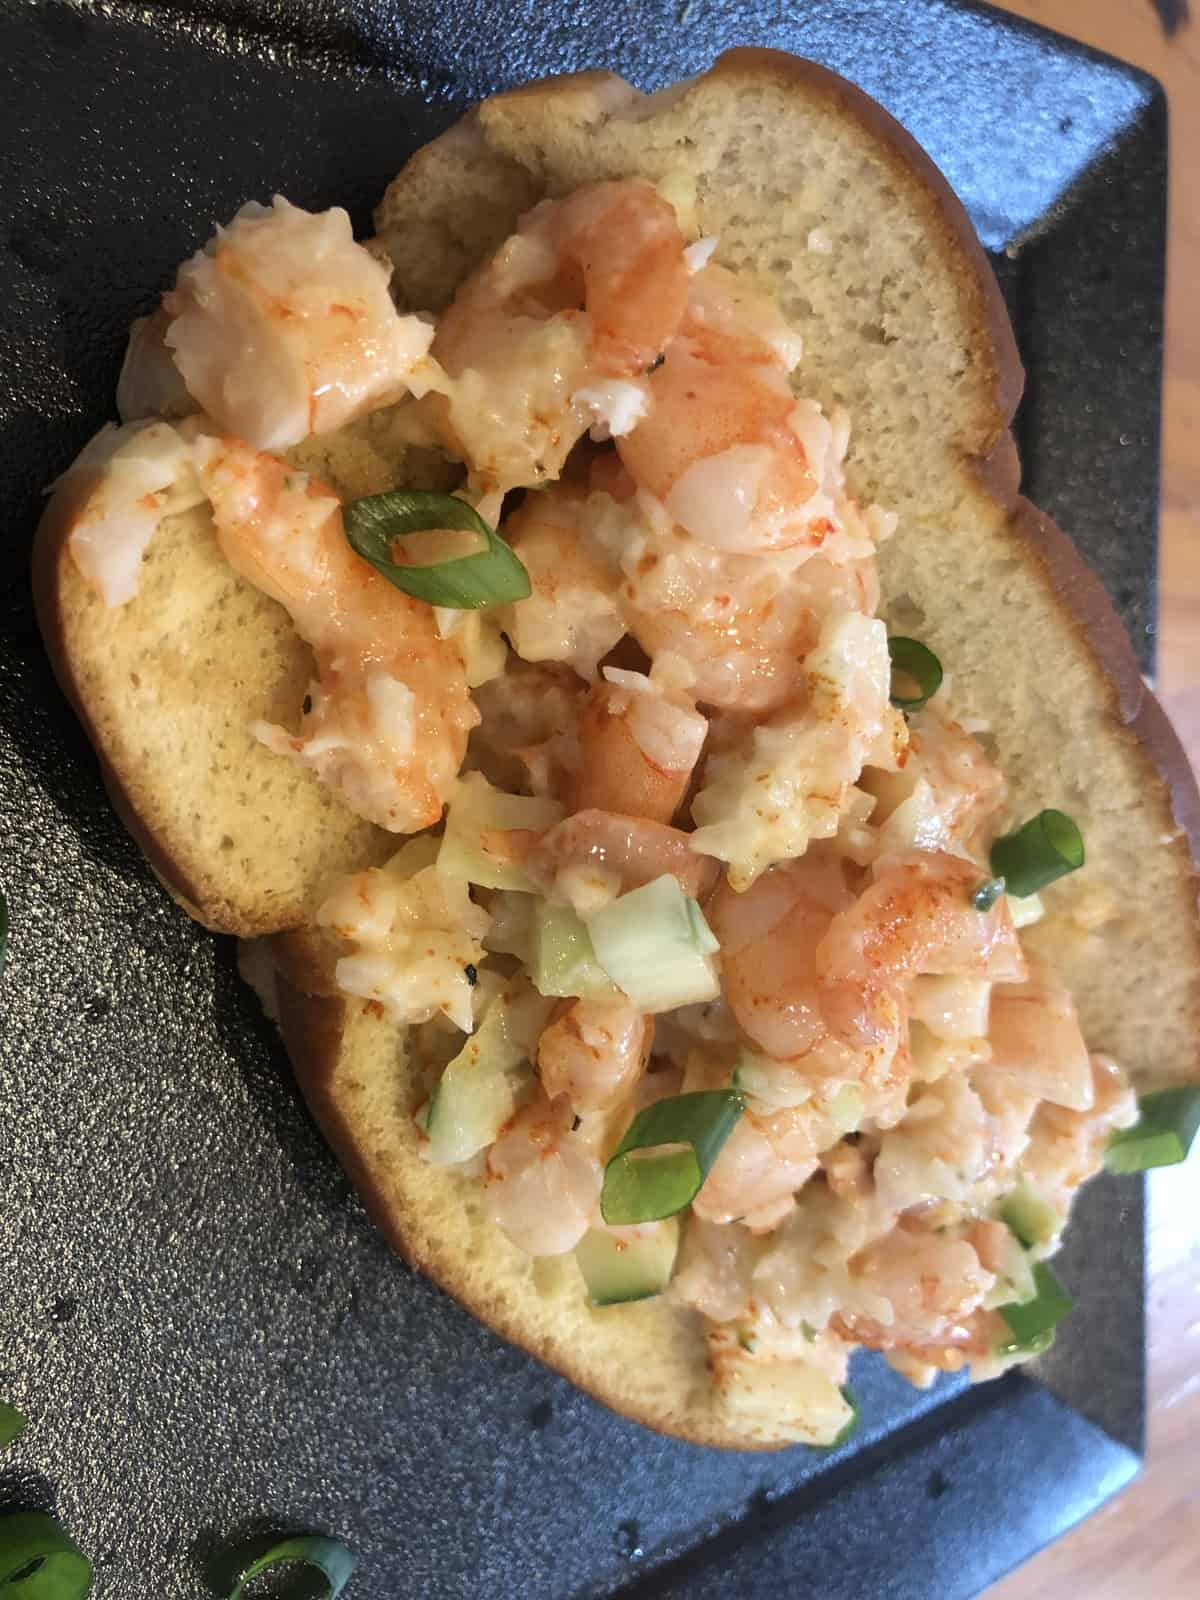 shrimp salad on a hot dog bun on a black plate